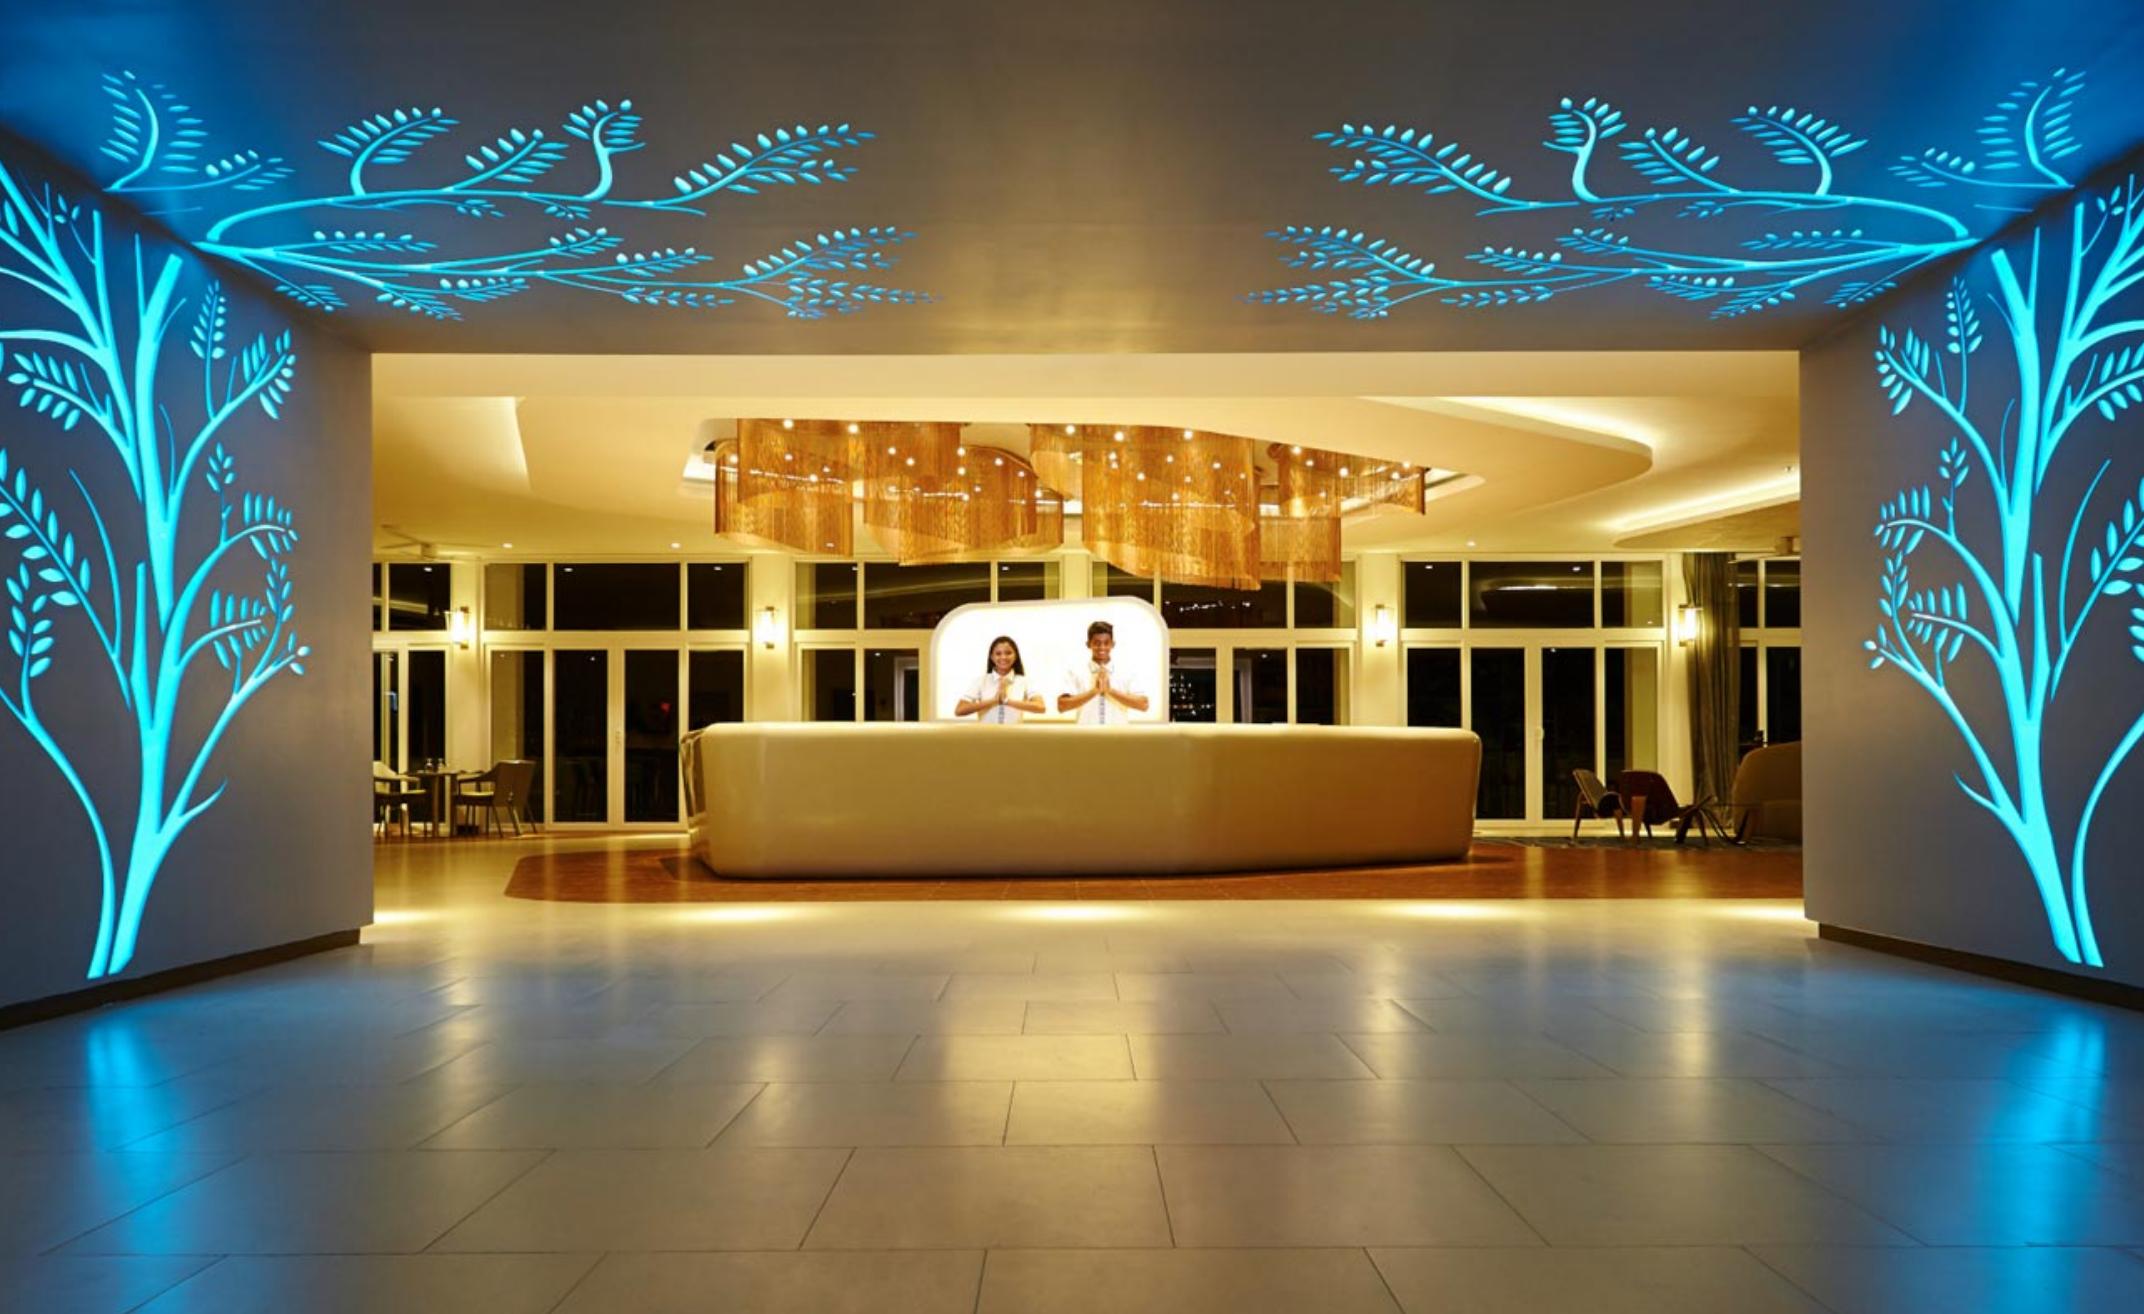 invite-to-paradise-sri-lanka-specialists-experts-holiday-honeymoon-travel-agent-tour-operator-kandy-luxury-city-ozo-3.png